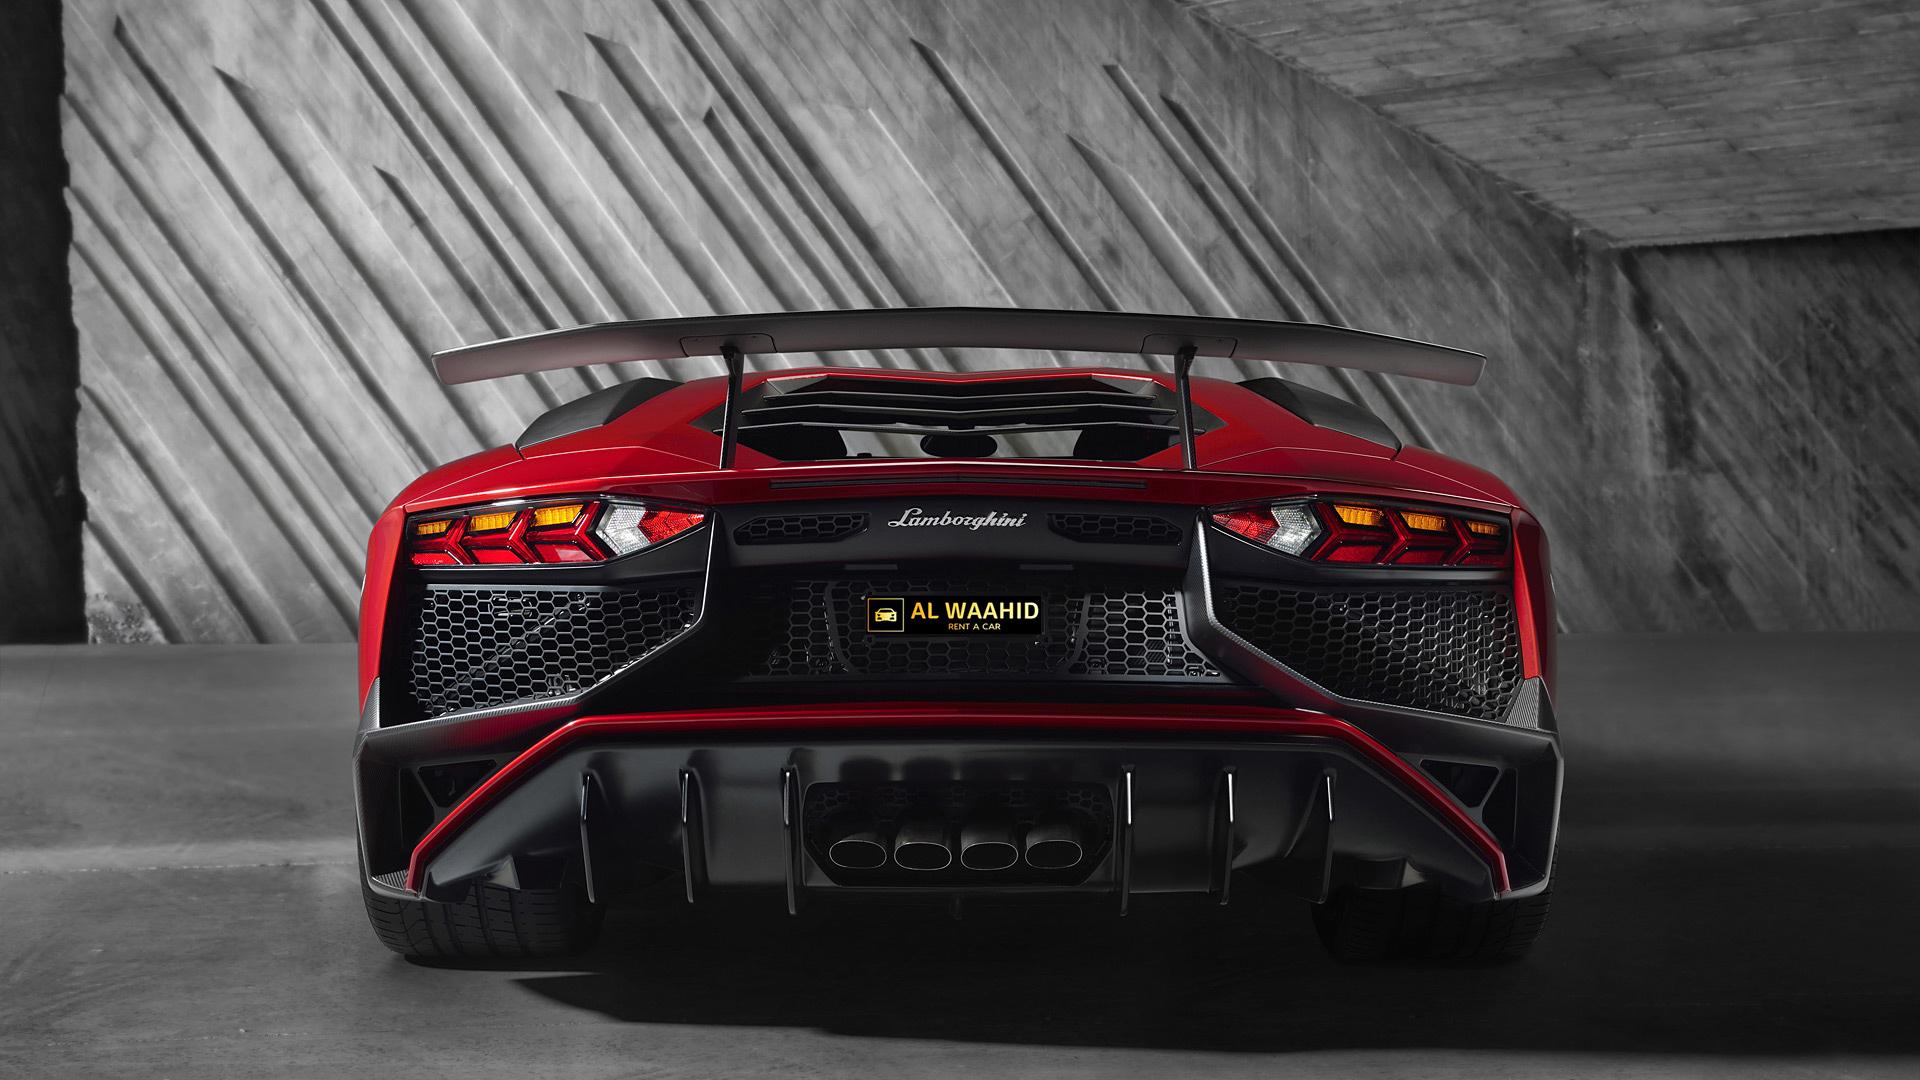 Lamborghini-Aventador-LP750-4-SV – 05